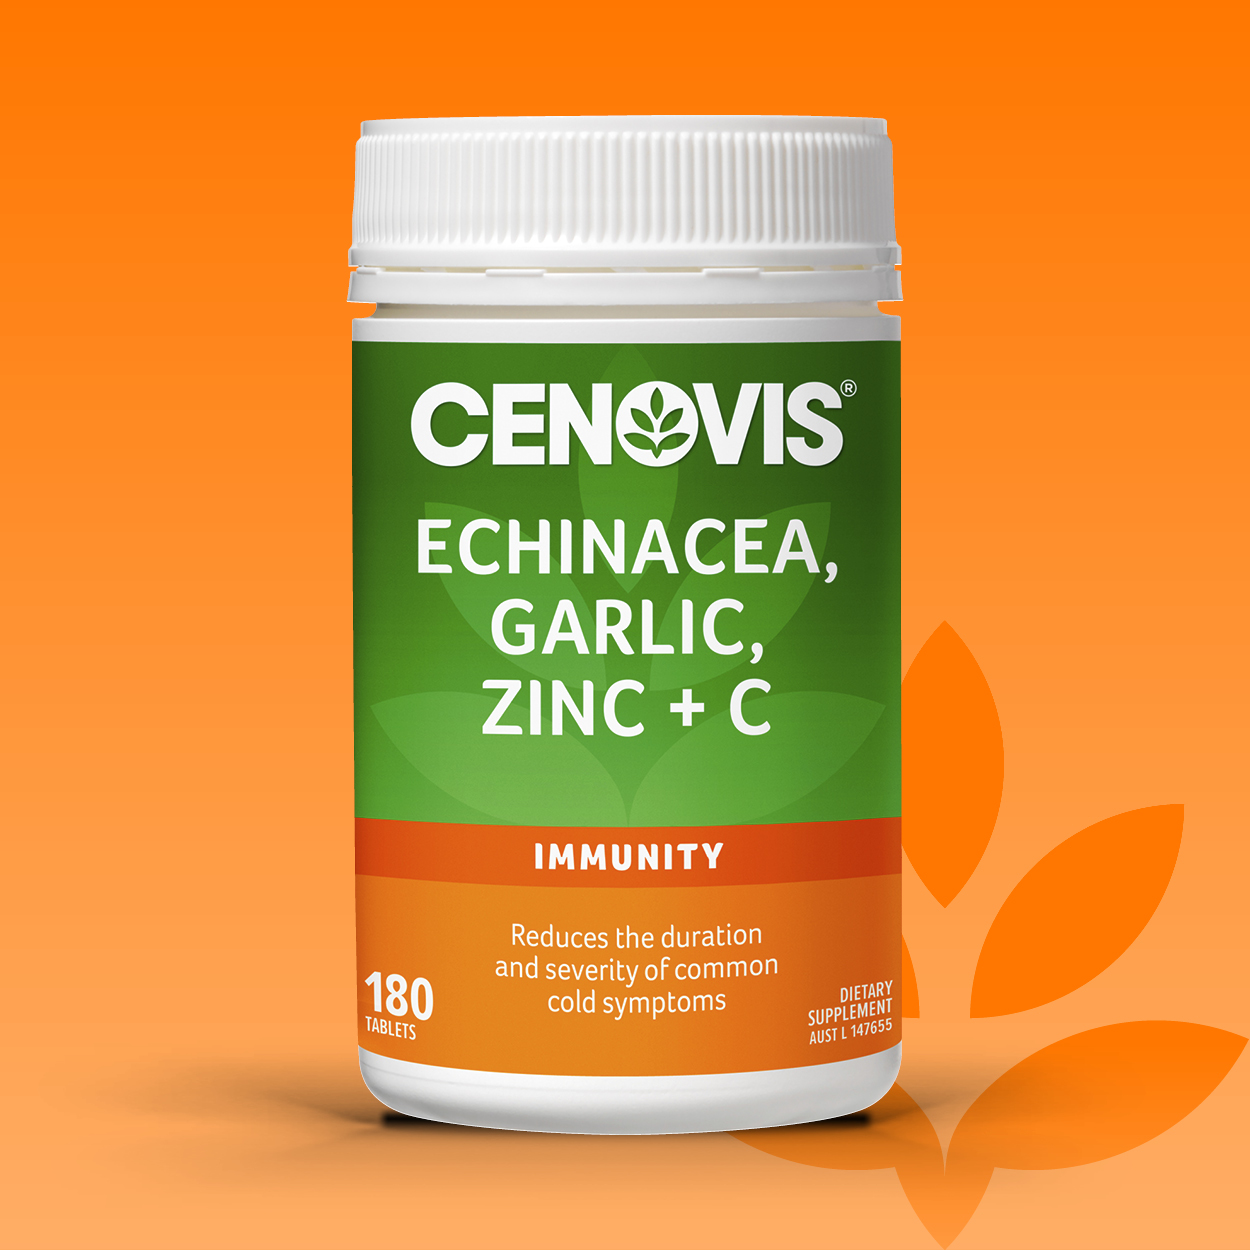 Cenovis Echinacea, Garlic, Zinc & C